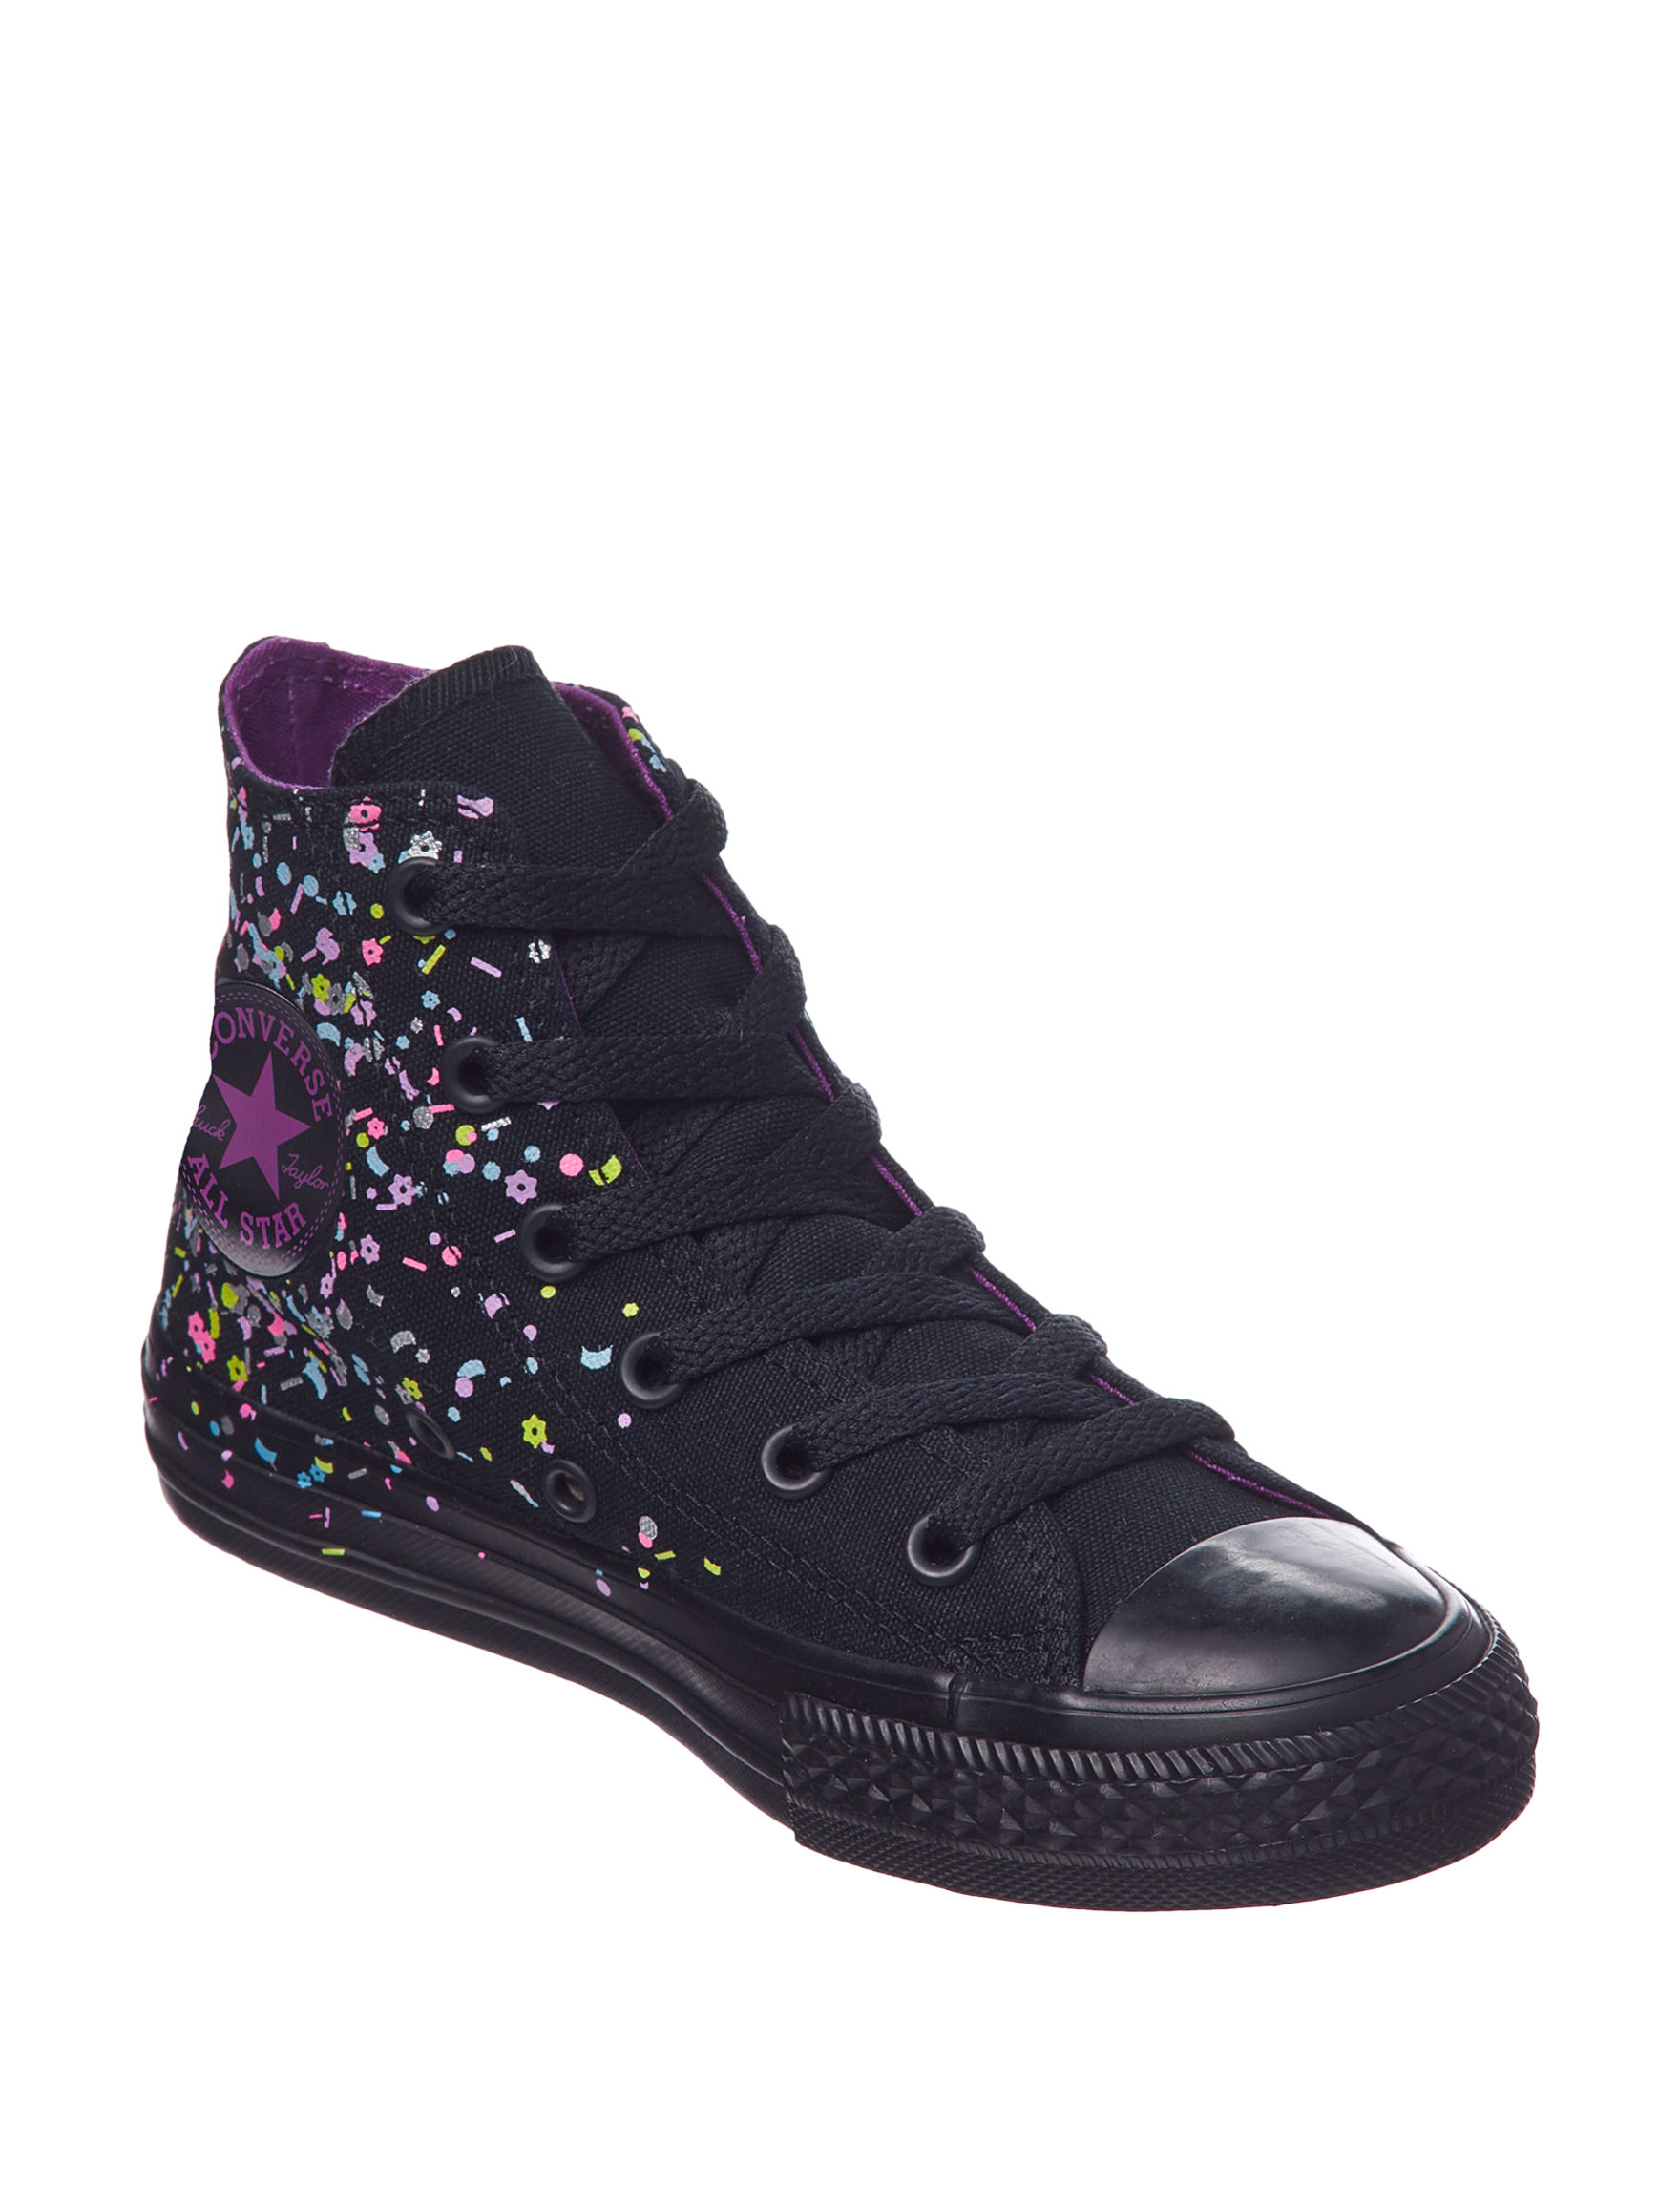 94722f780dd6 Converse Chuck Taylor All-Stars Confetti Hi Lace-Up Shoes - Girls 11-3